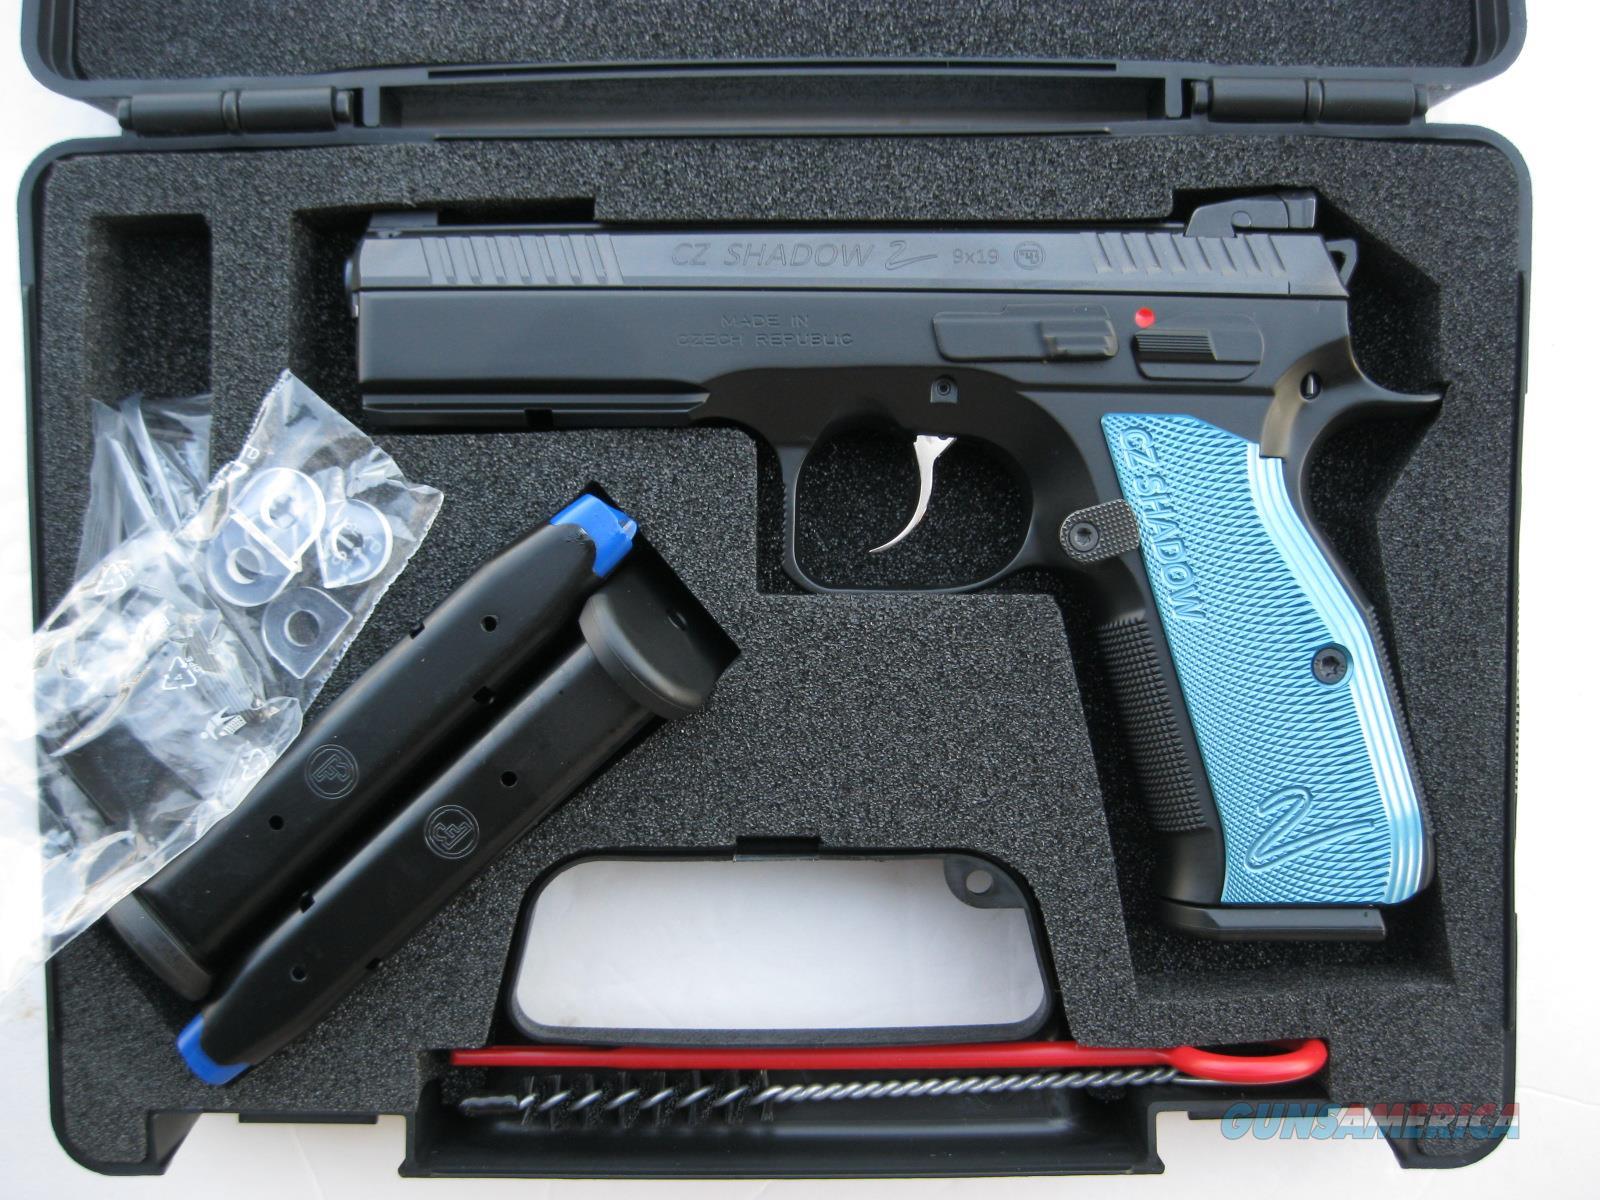 CZ Shadow 2 Black 9mm 3-17 Rd Mags Hajo FO 91257 *NEW*  Guns > Pistols > CZ Pistols